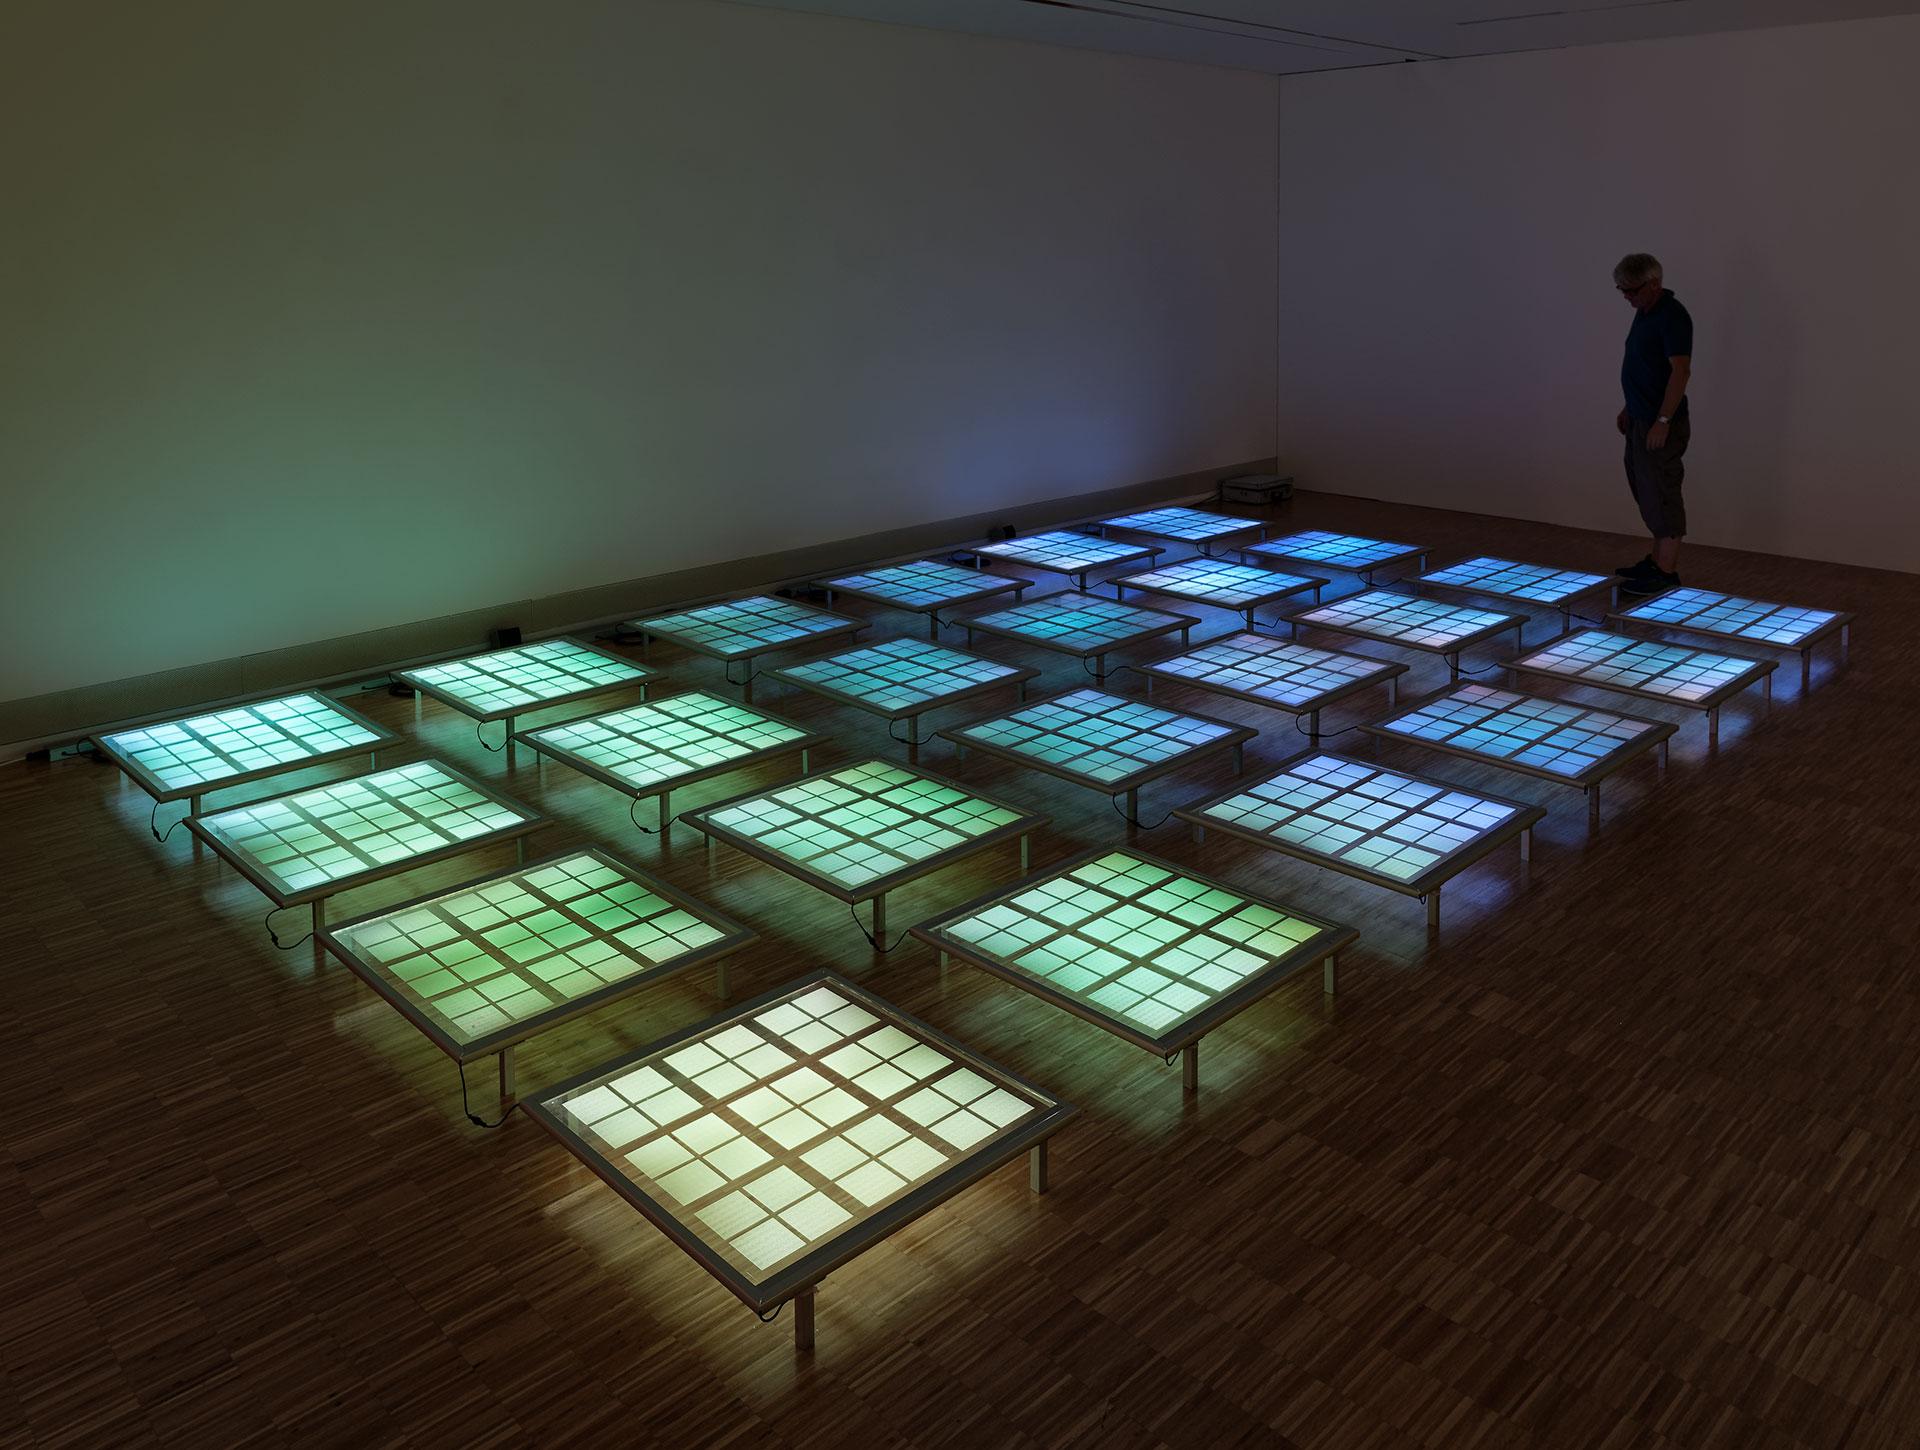 daniel_hausig_pool_II_2019_light-installation